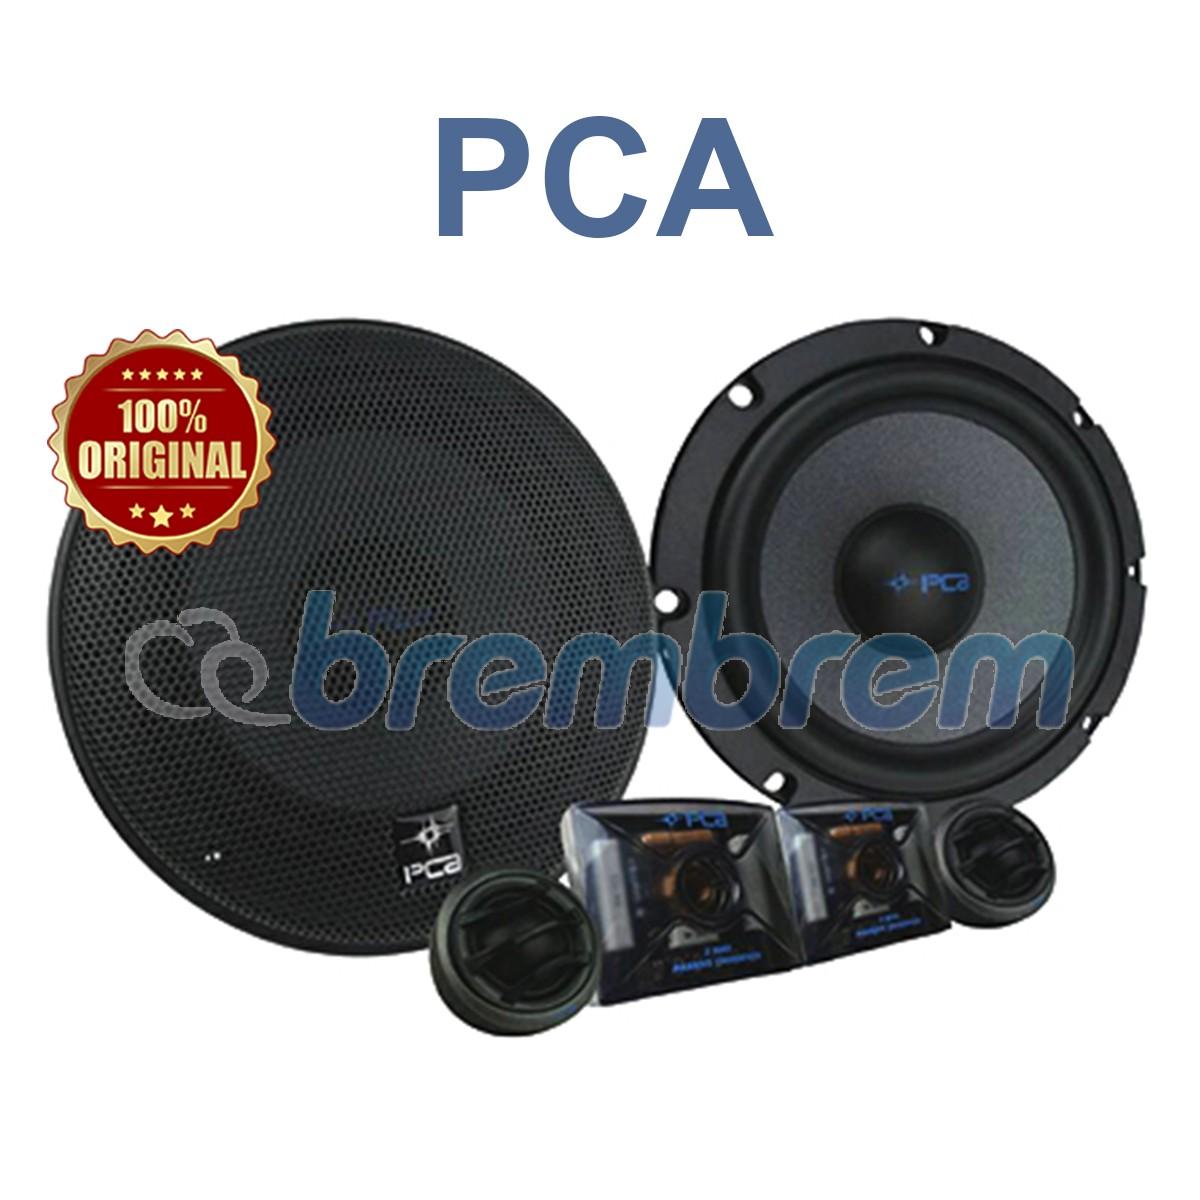 PCA REF 612 - SPEAKER 2 WAY